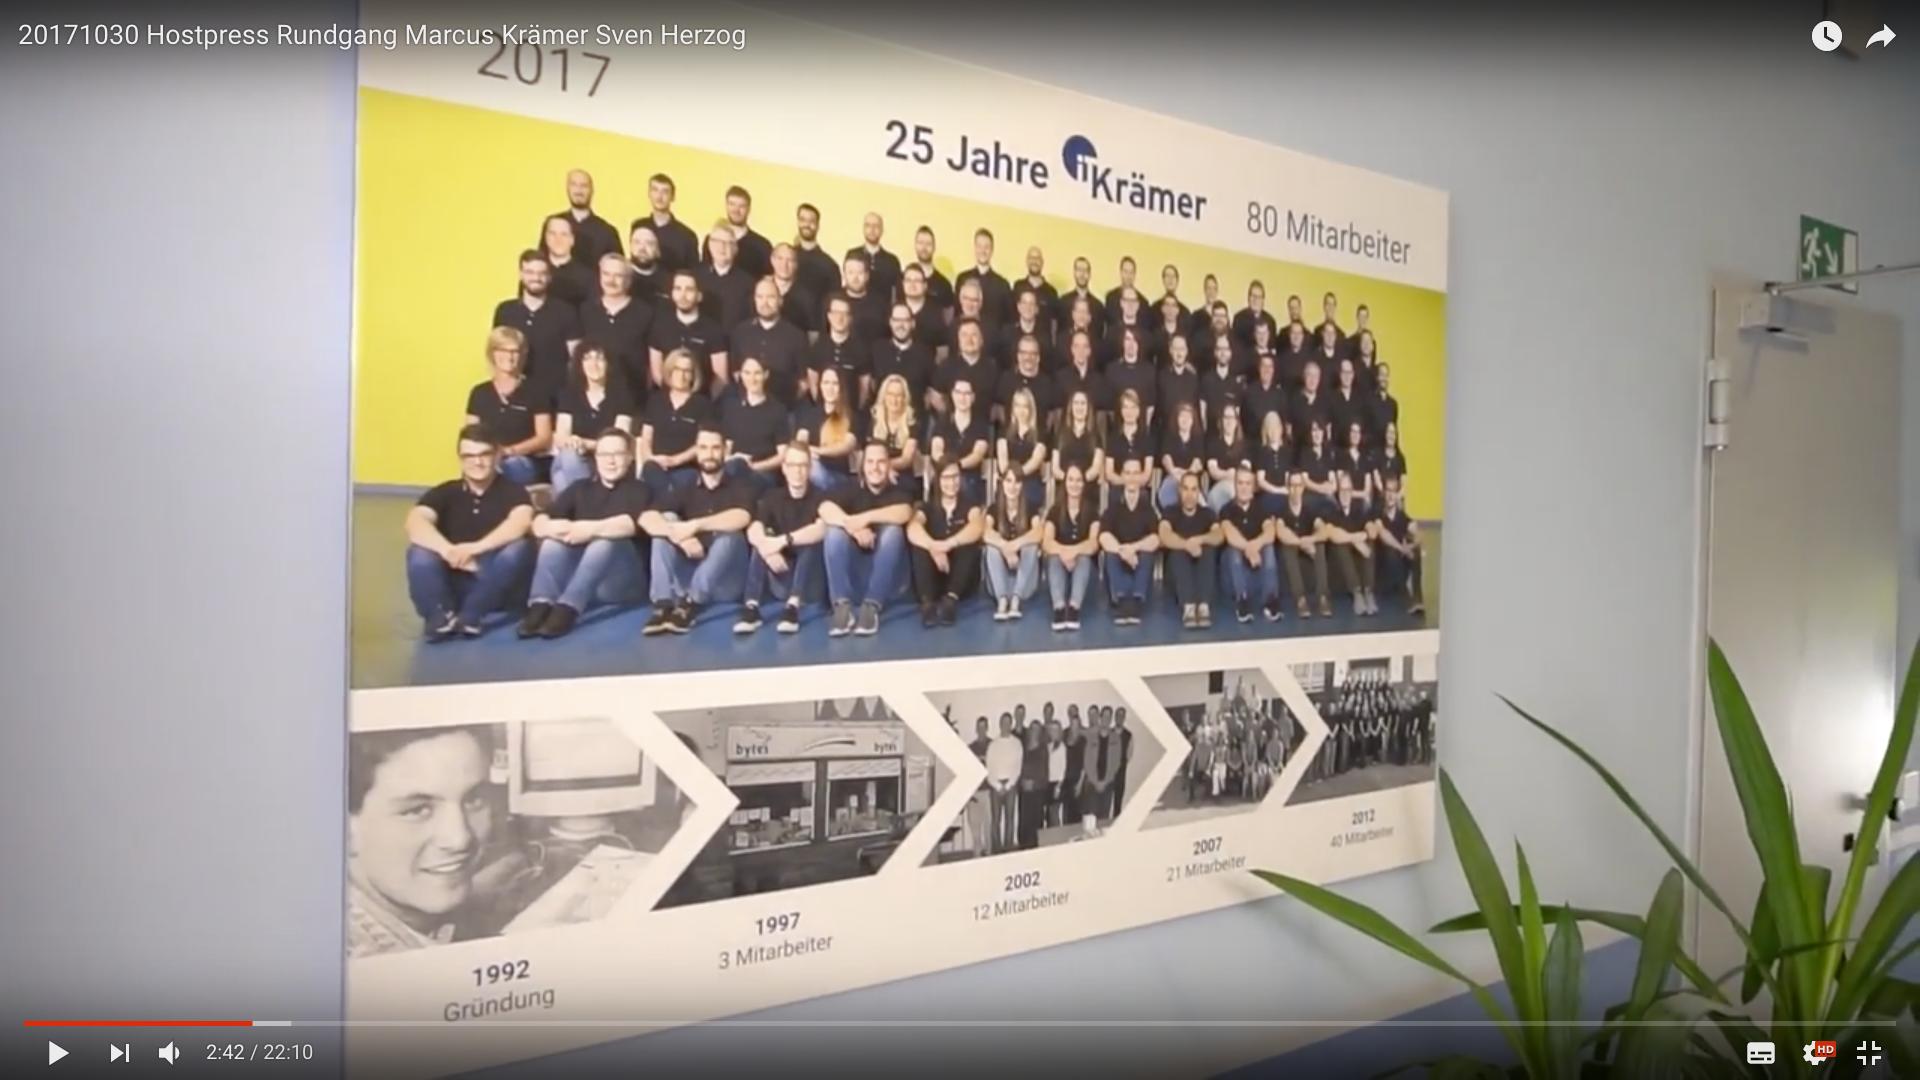 2017 Hostpress Mitarbeiter _MSM_MEDIEN_SAAR_MOSEL_SAARLAND_FERNSEHEN_1_ED_SAAR